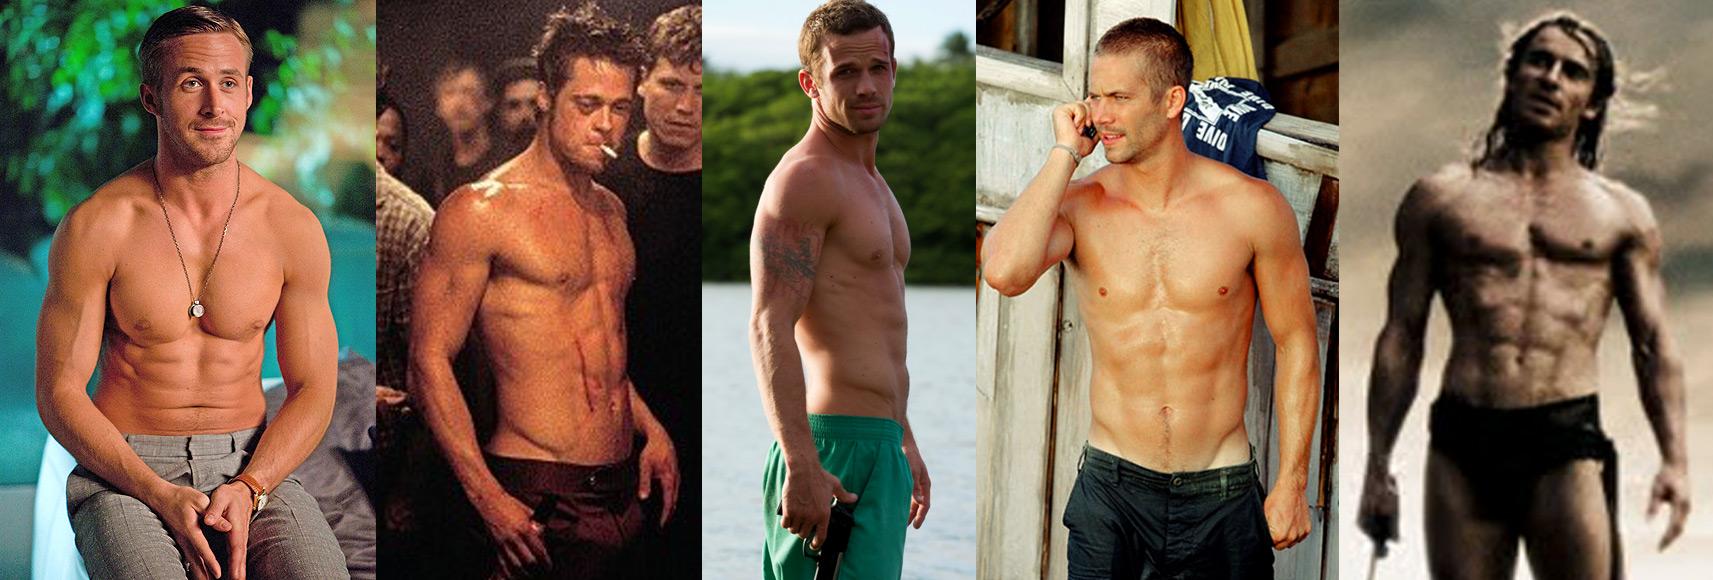 Ryan Gosling, Brad Pitt, Cam Gigandet, Paul Walker, Michael Fassbender Bodies & Ectomorph Genetics